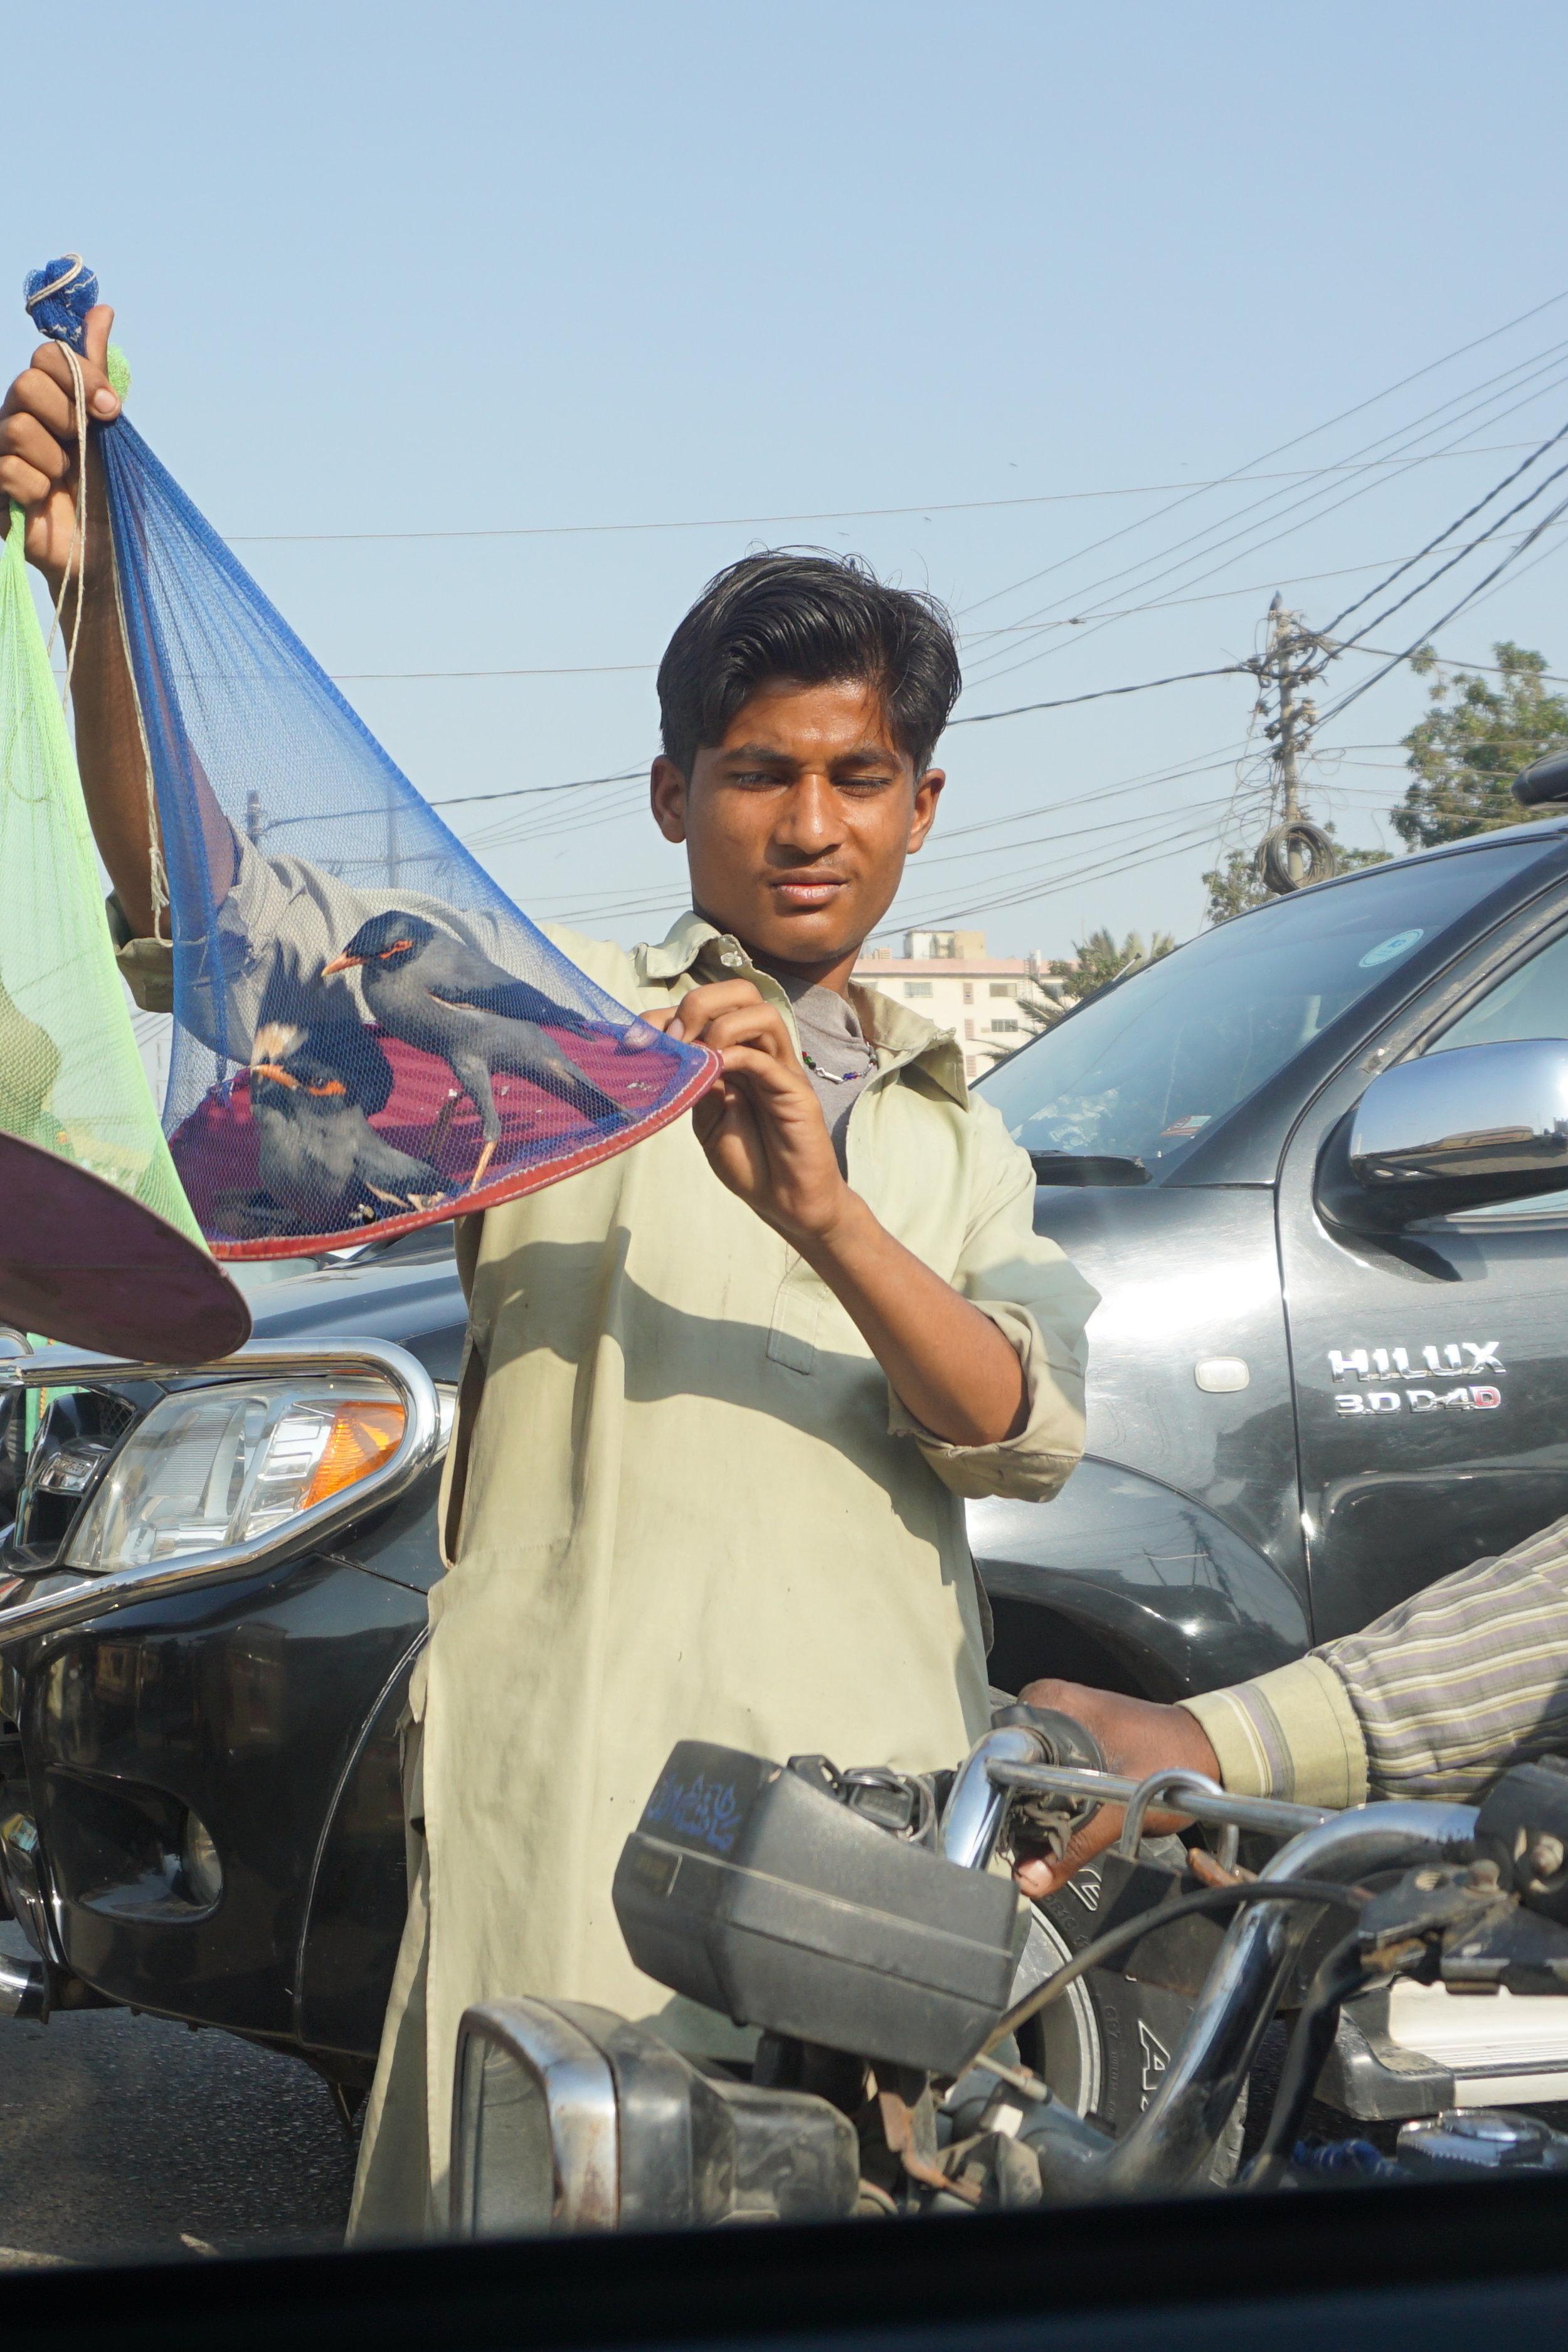 Roads of Karachi, Pakistan